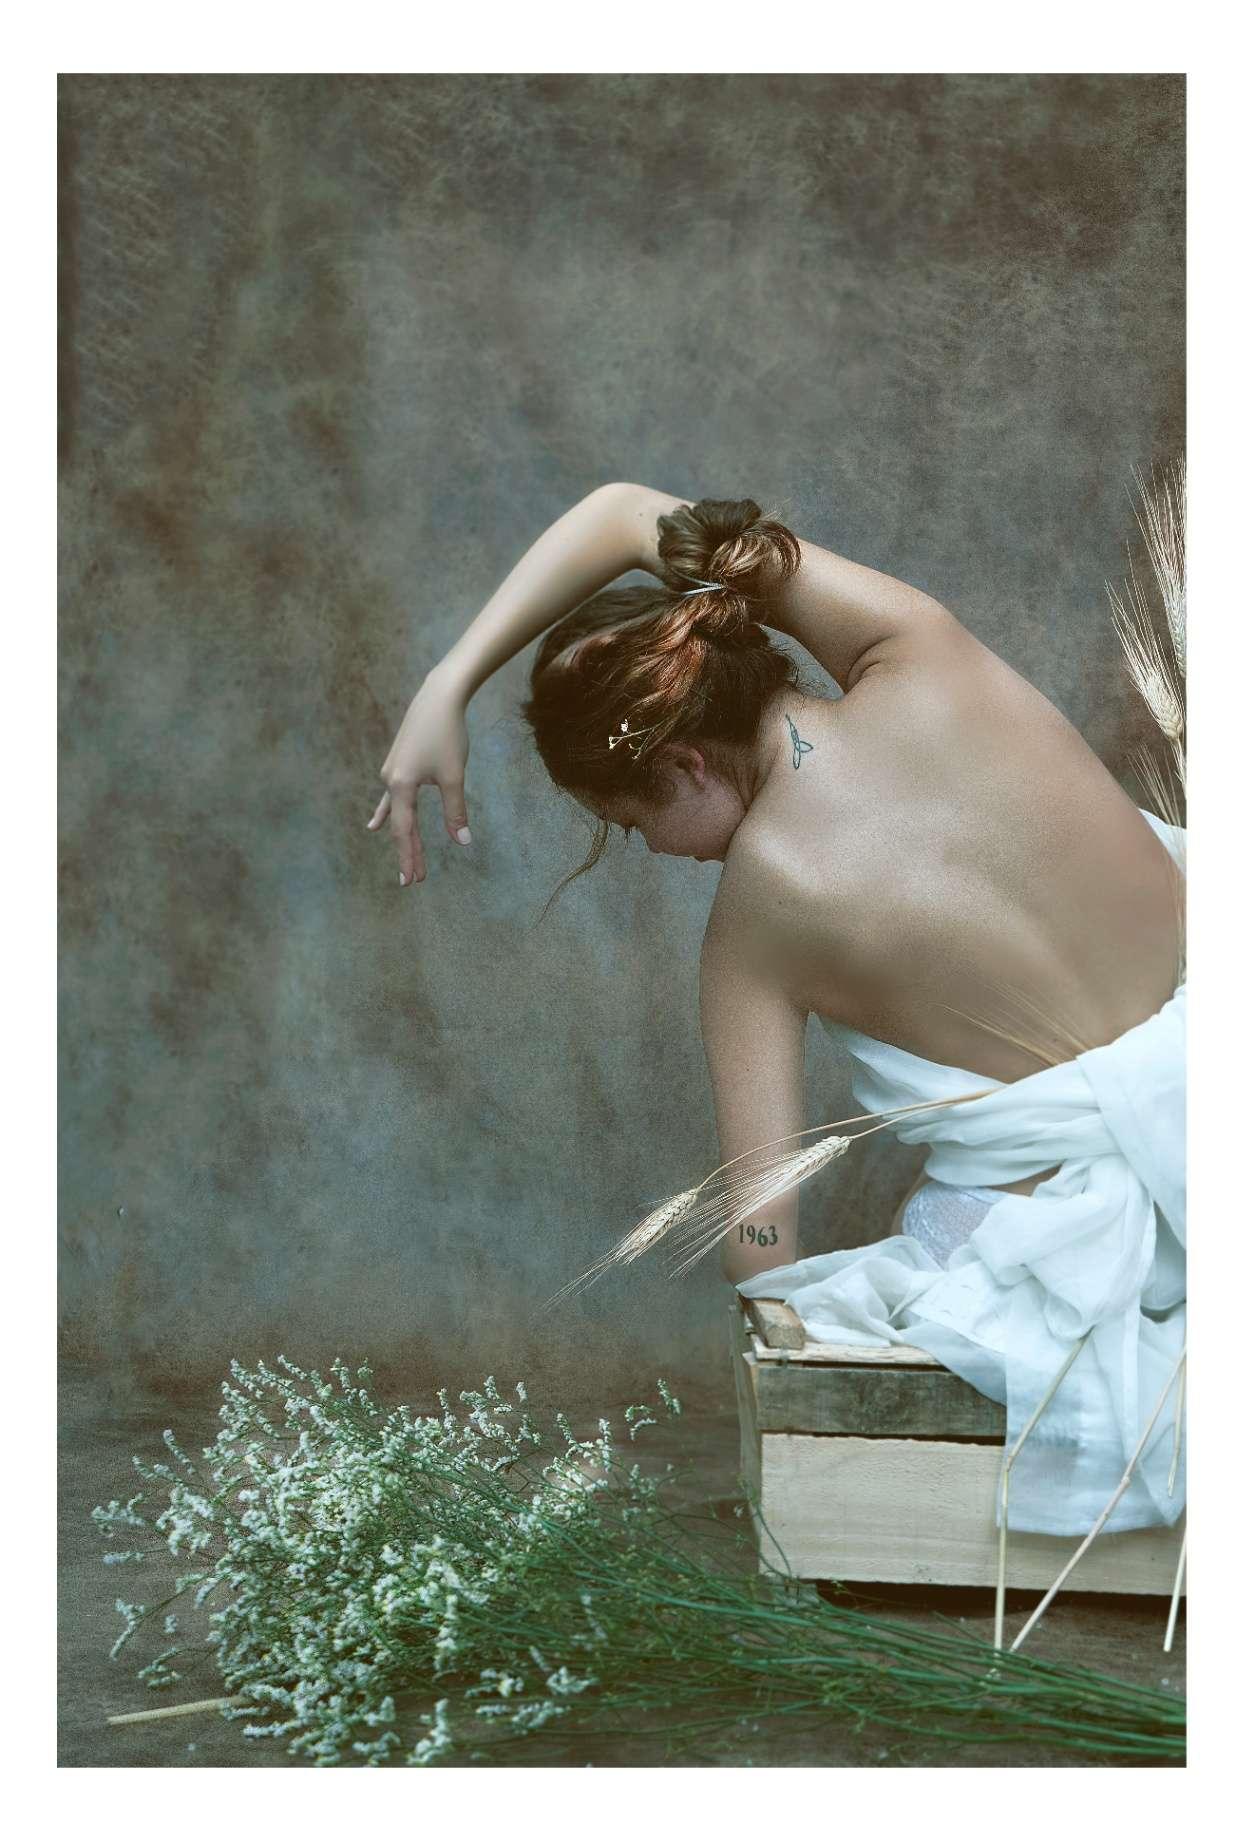 Obra: 1917